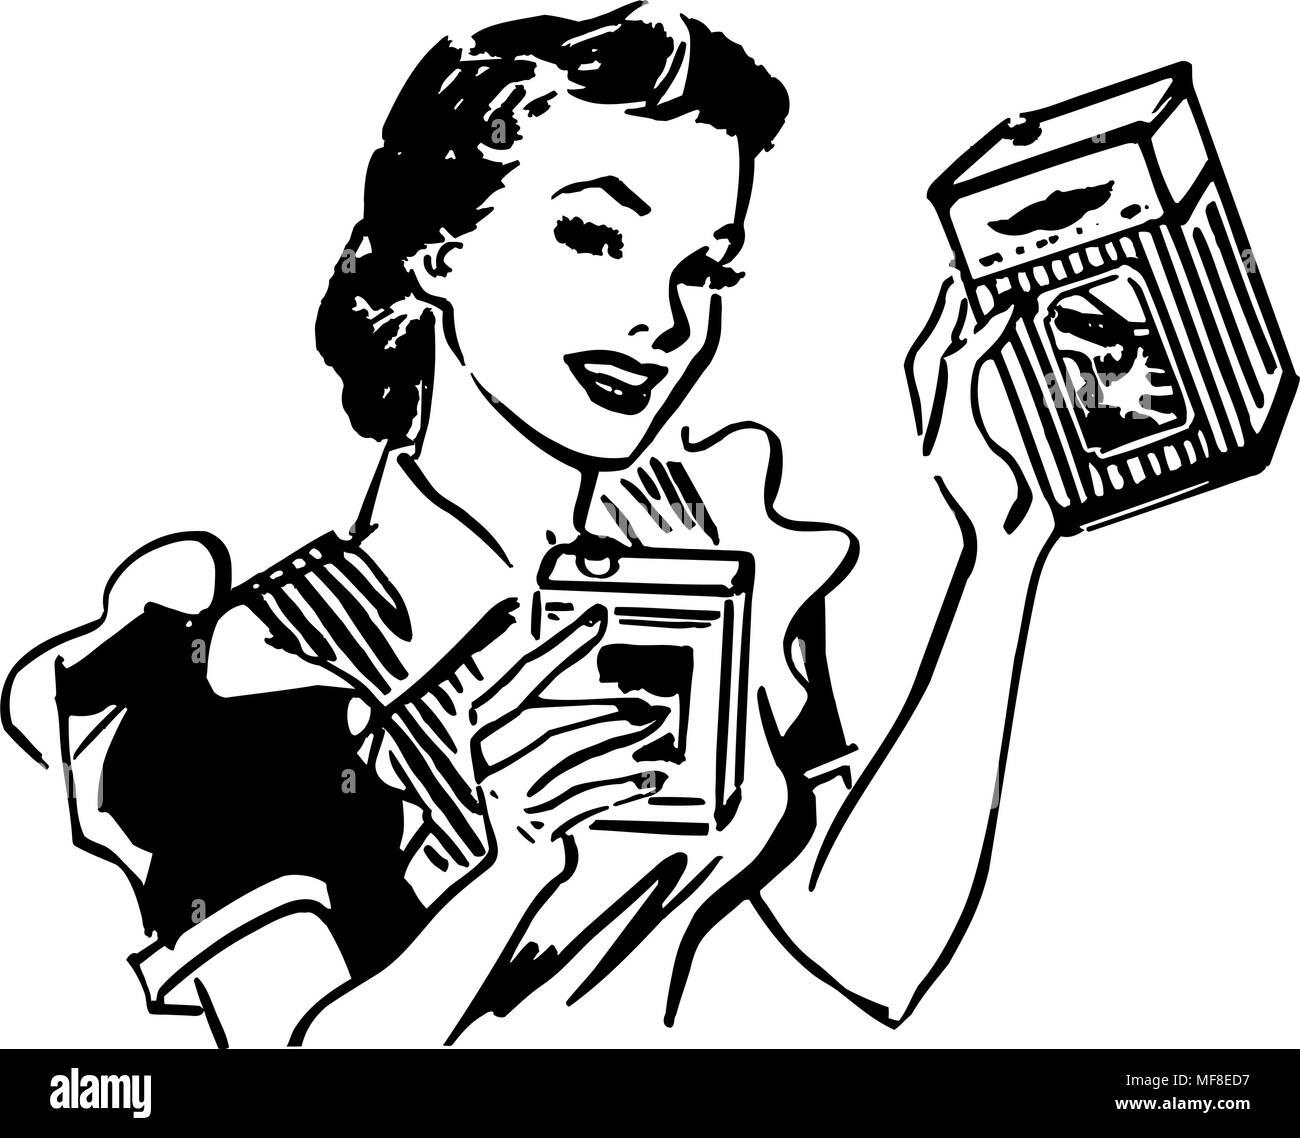 Get 1960S Housewife Cartoon Pictures